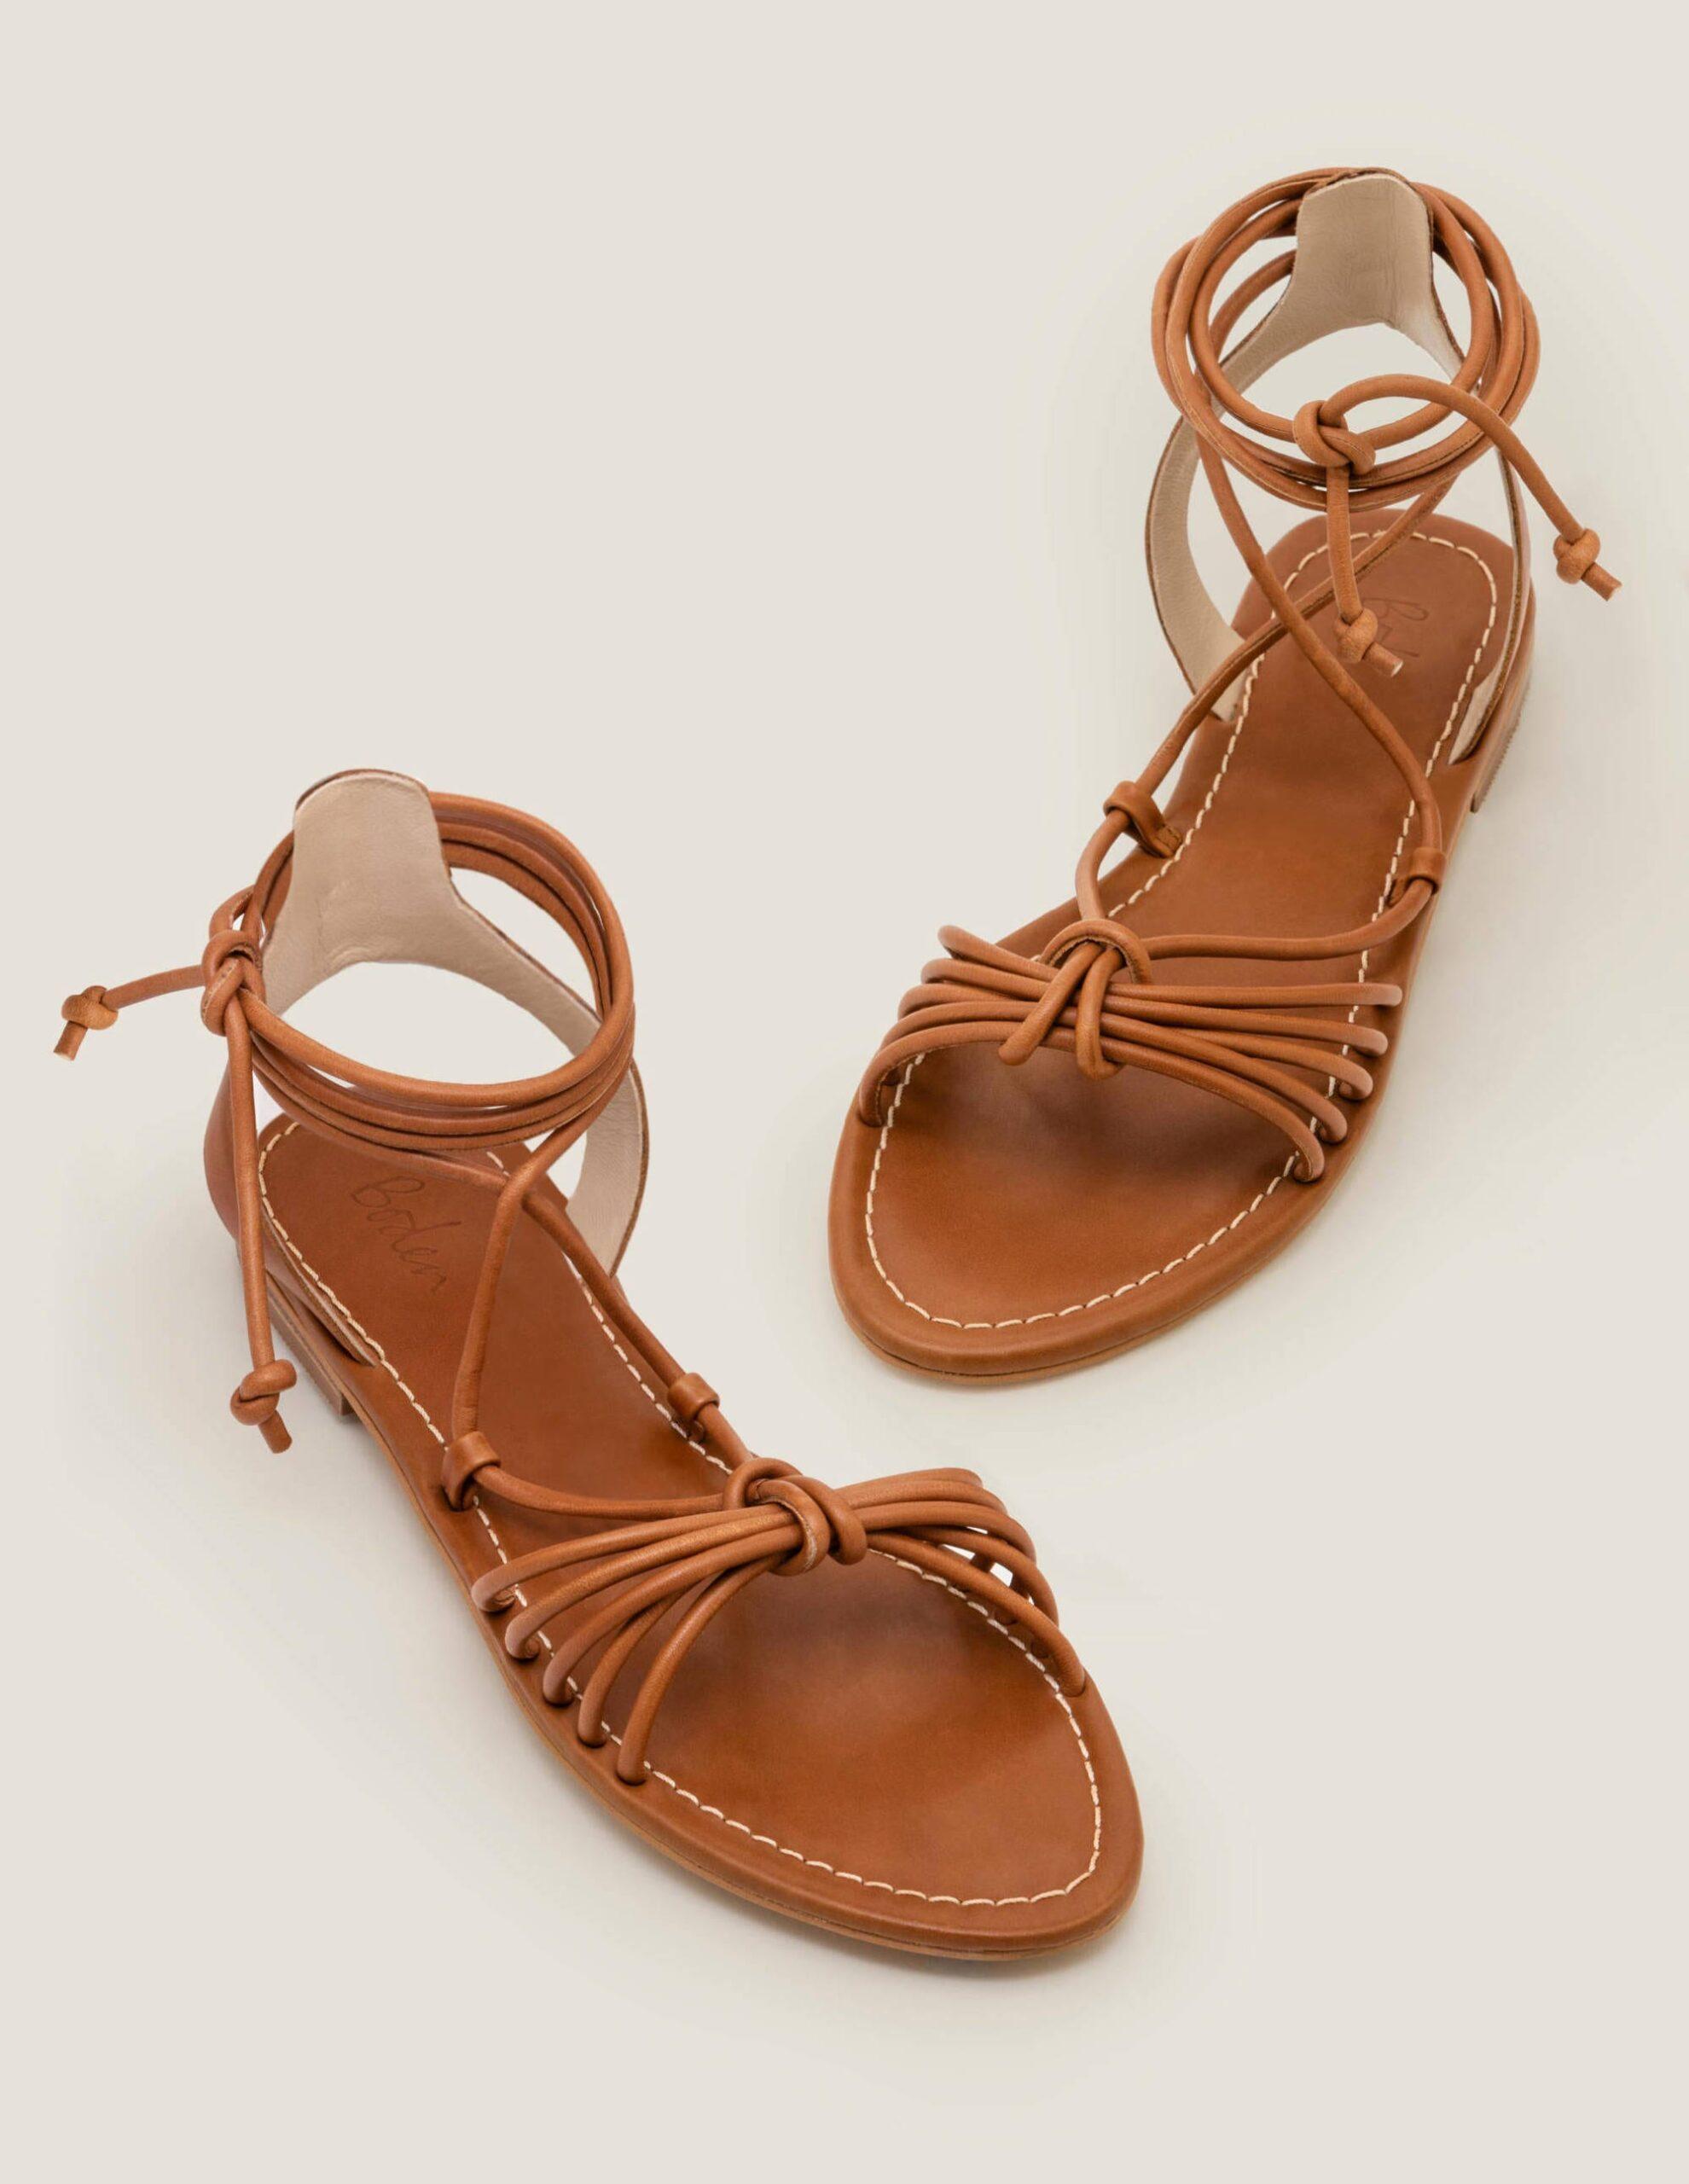 Boden Lucinda Gladiator Sandals